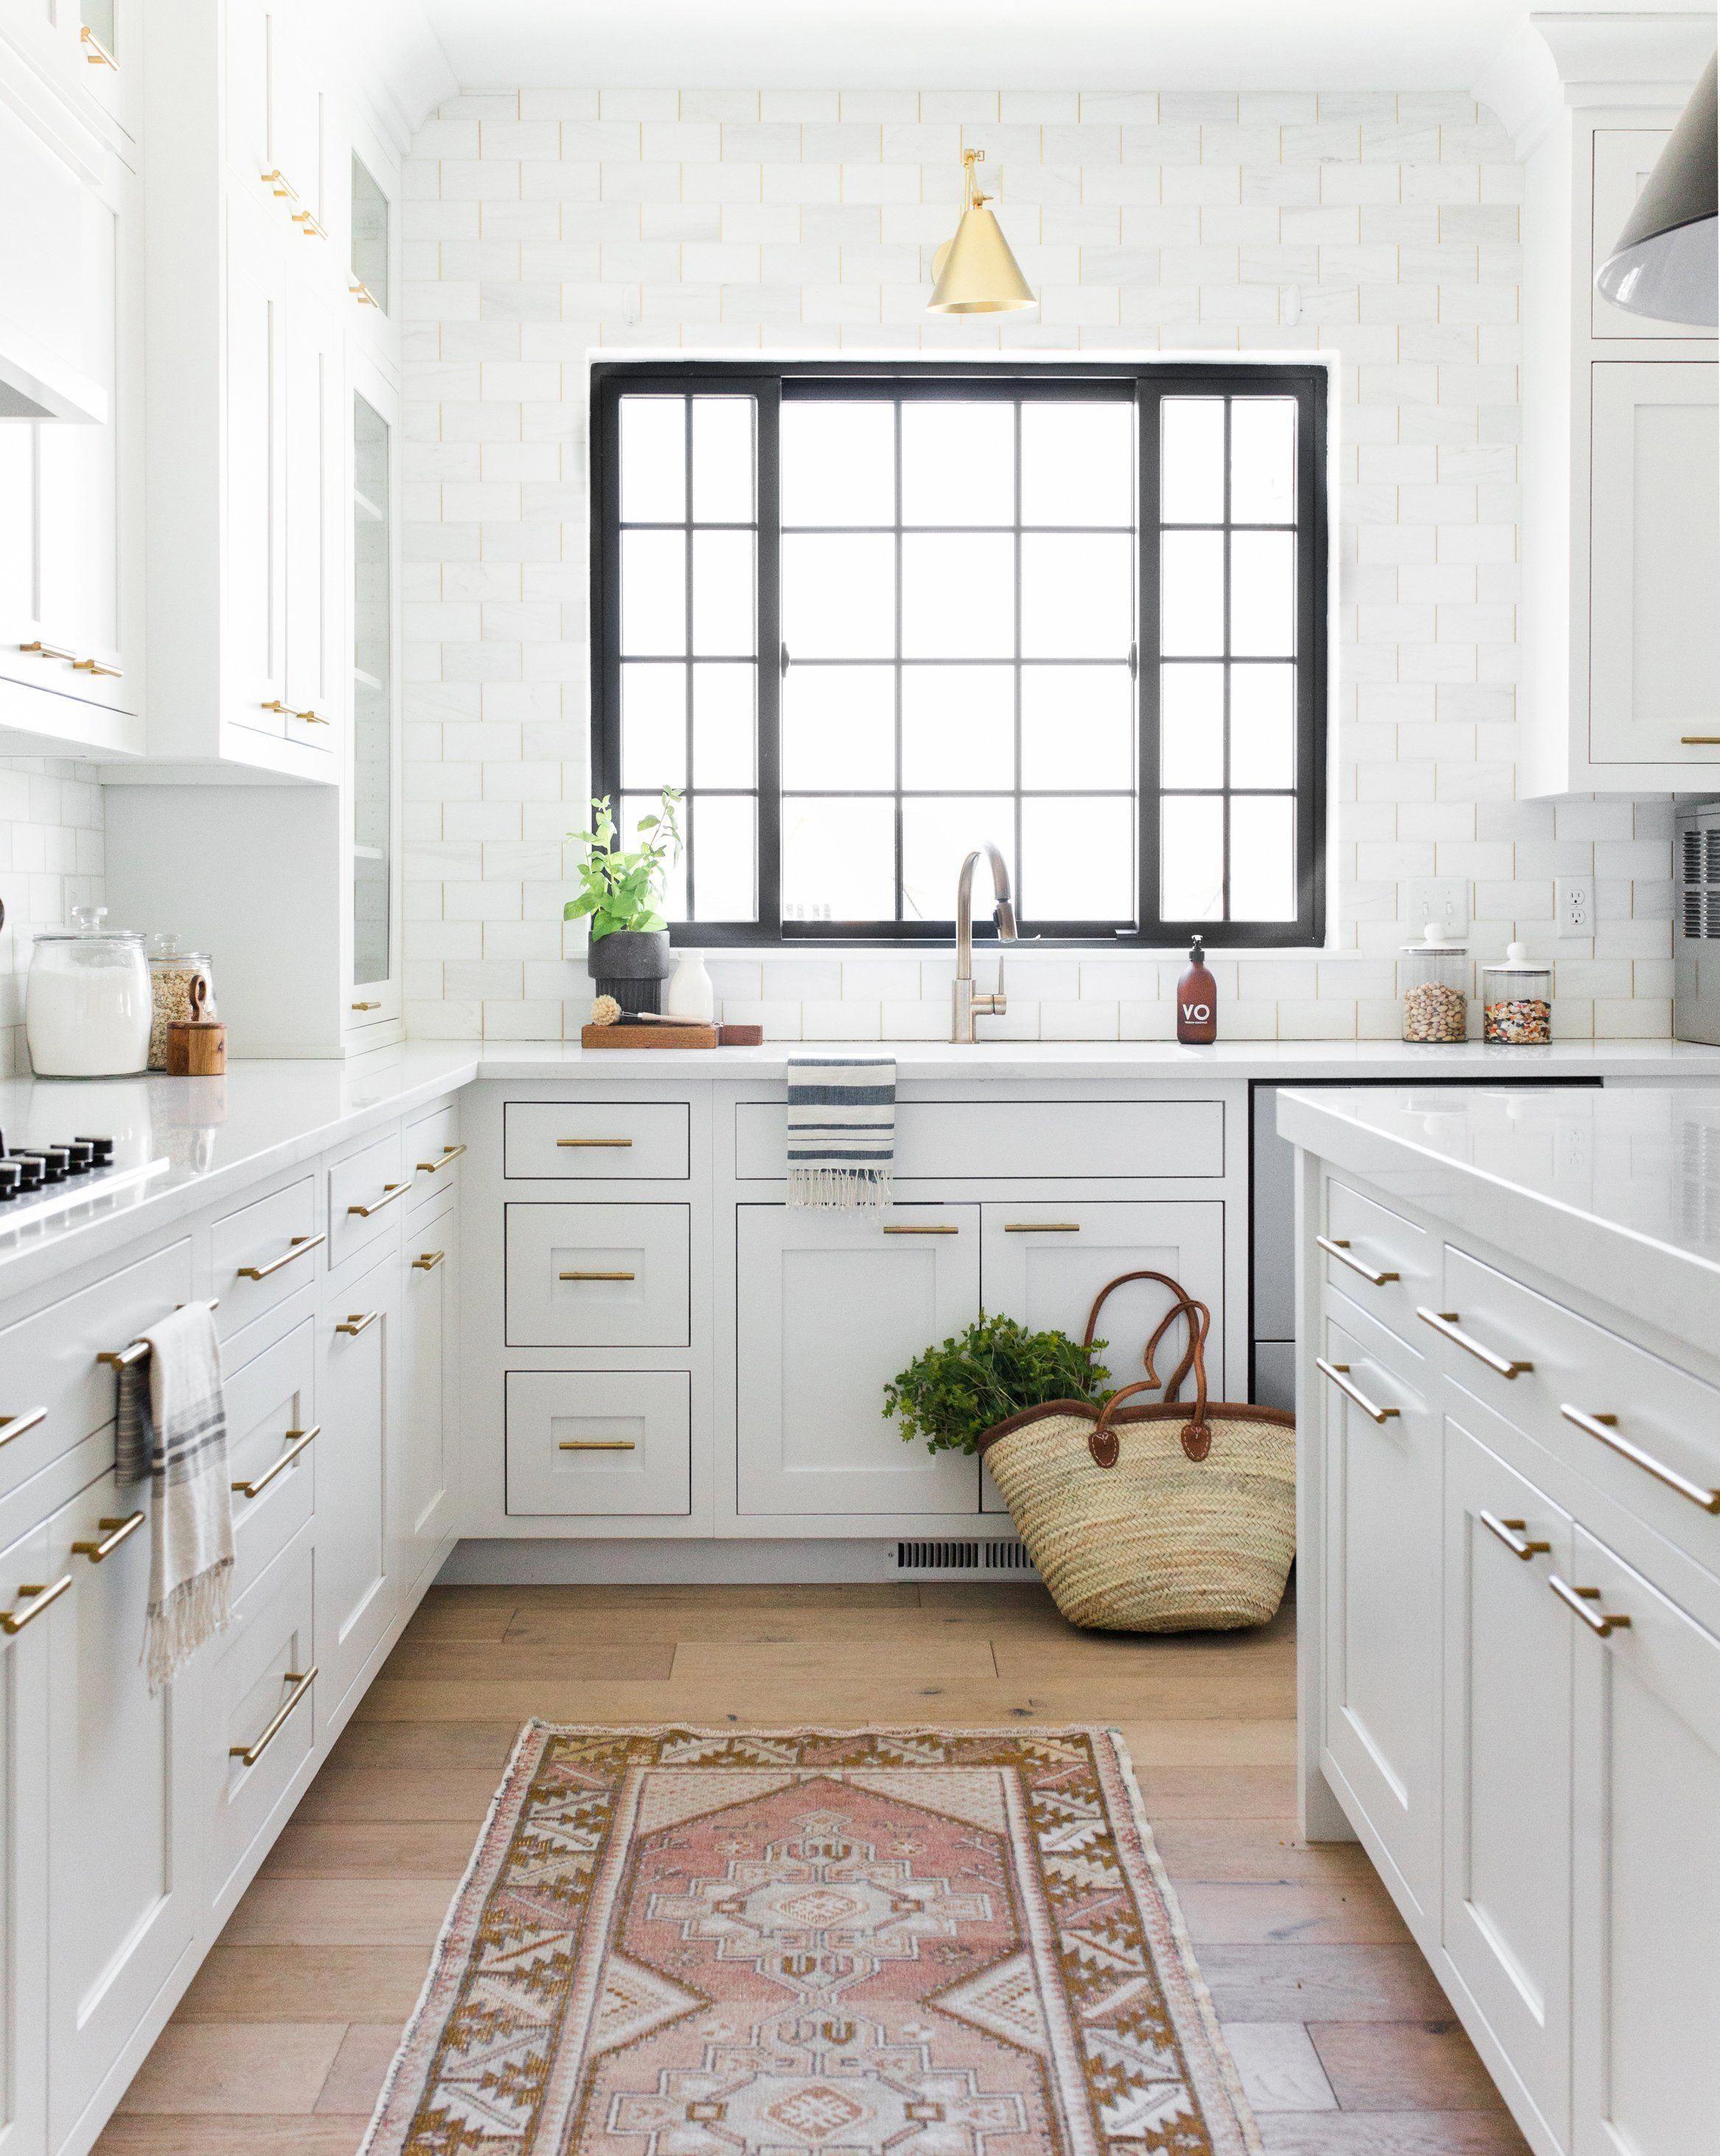 Like Black Window Trim White Subway Backsplash Door Pulls White Cabinets And Light Countertops H White Kitchen Design Modern Kitchen Design Kitchen Design